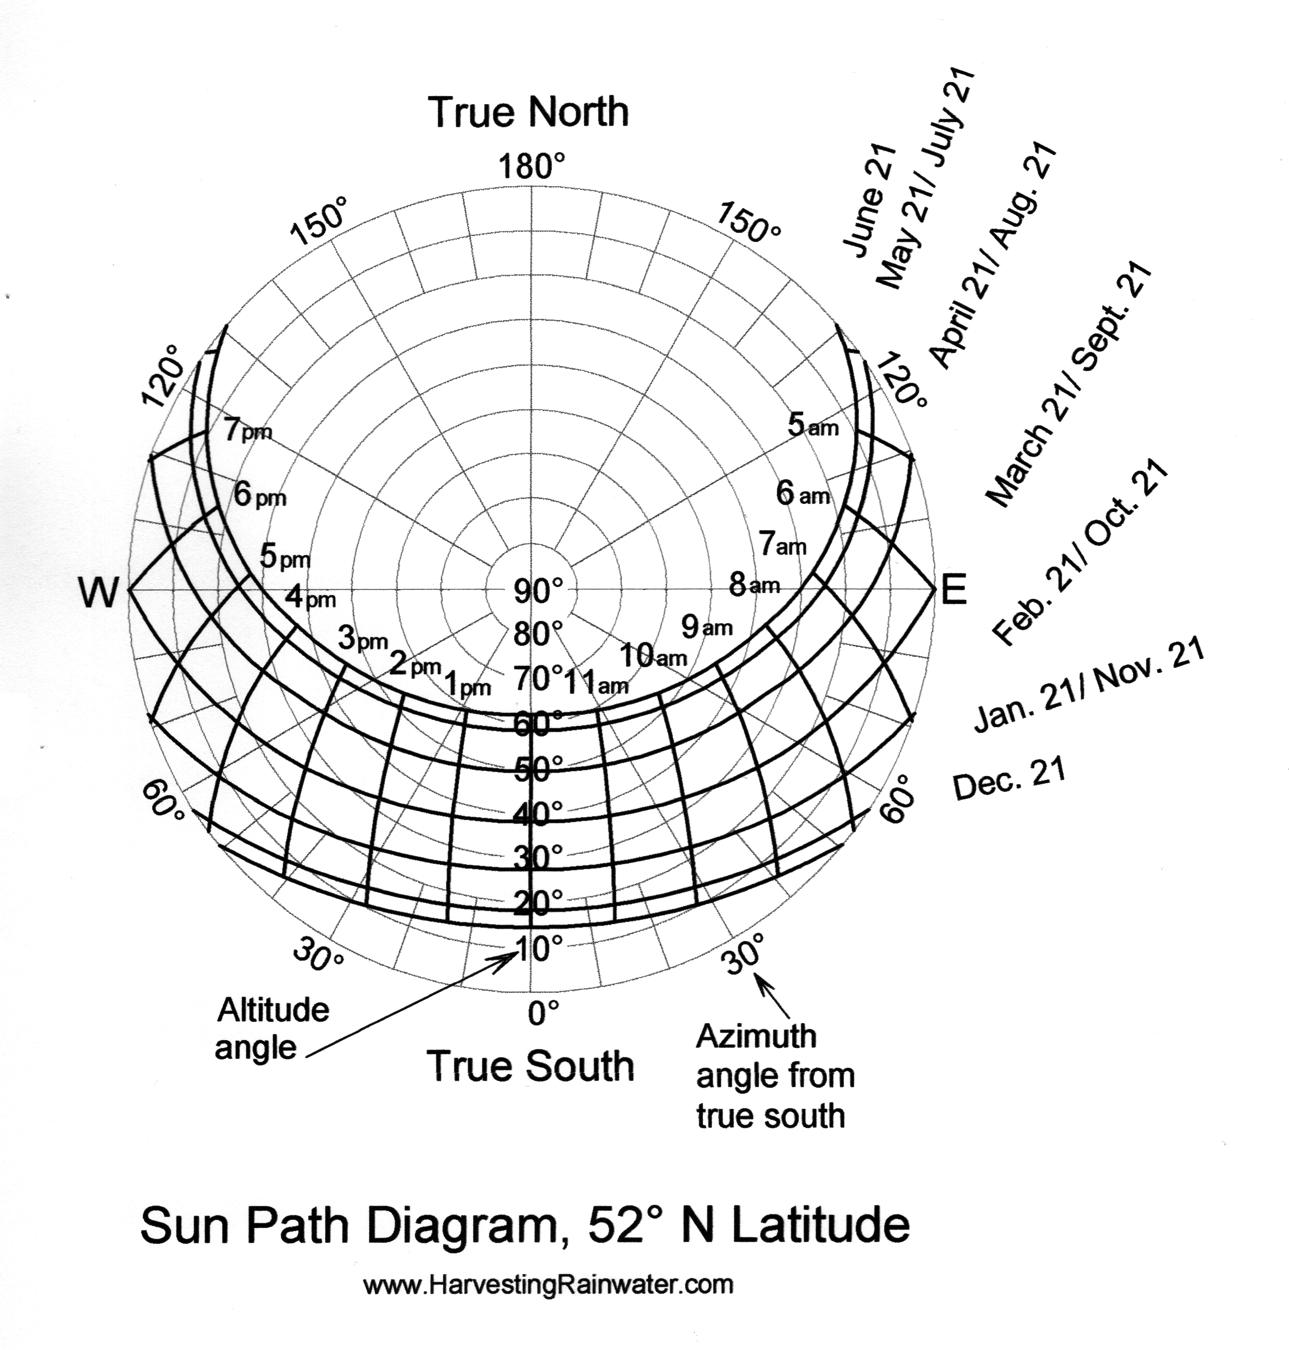 Sun Path Diagram 52o N Latitude